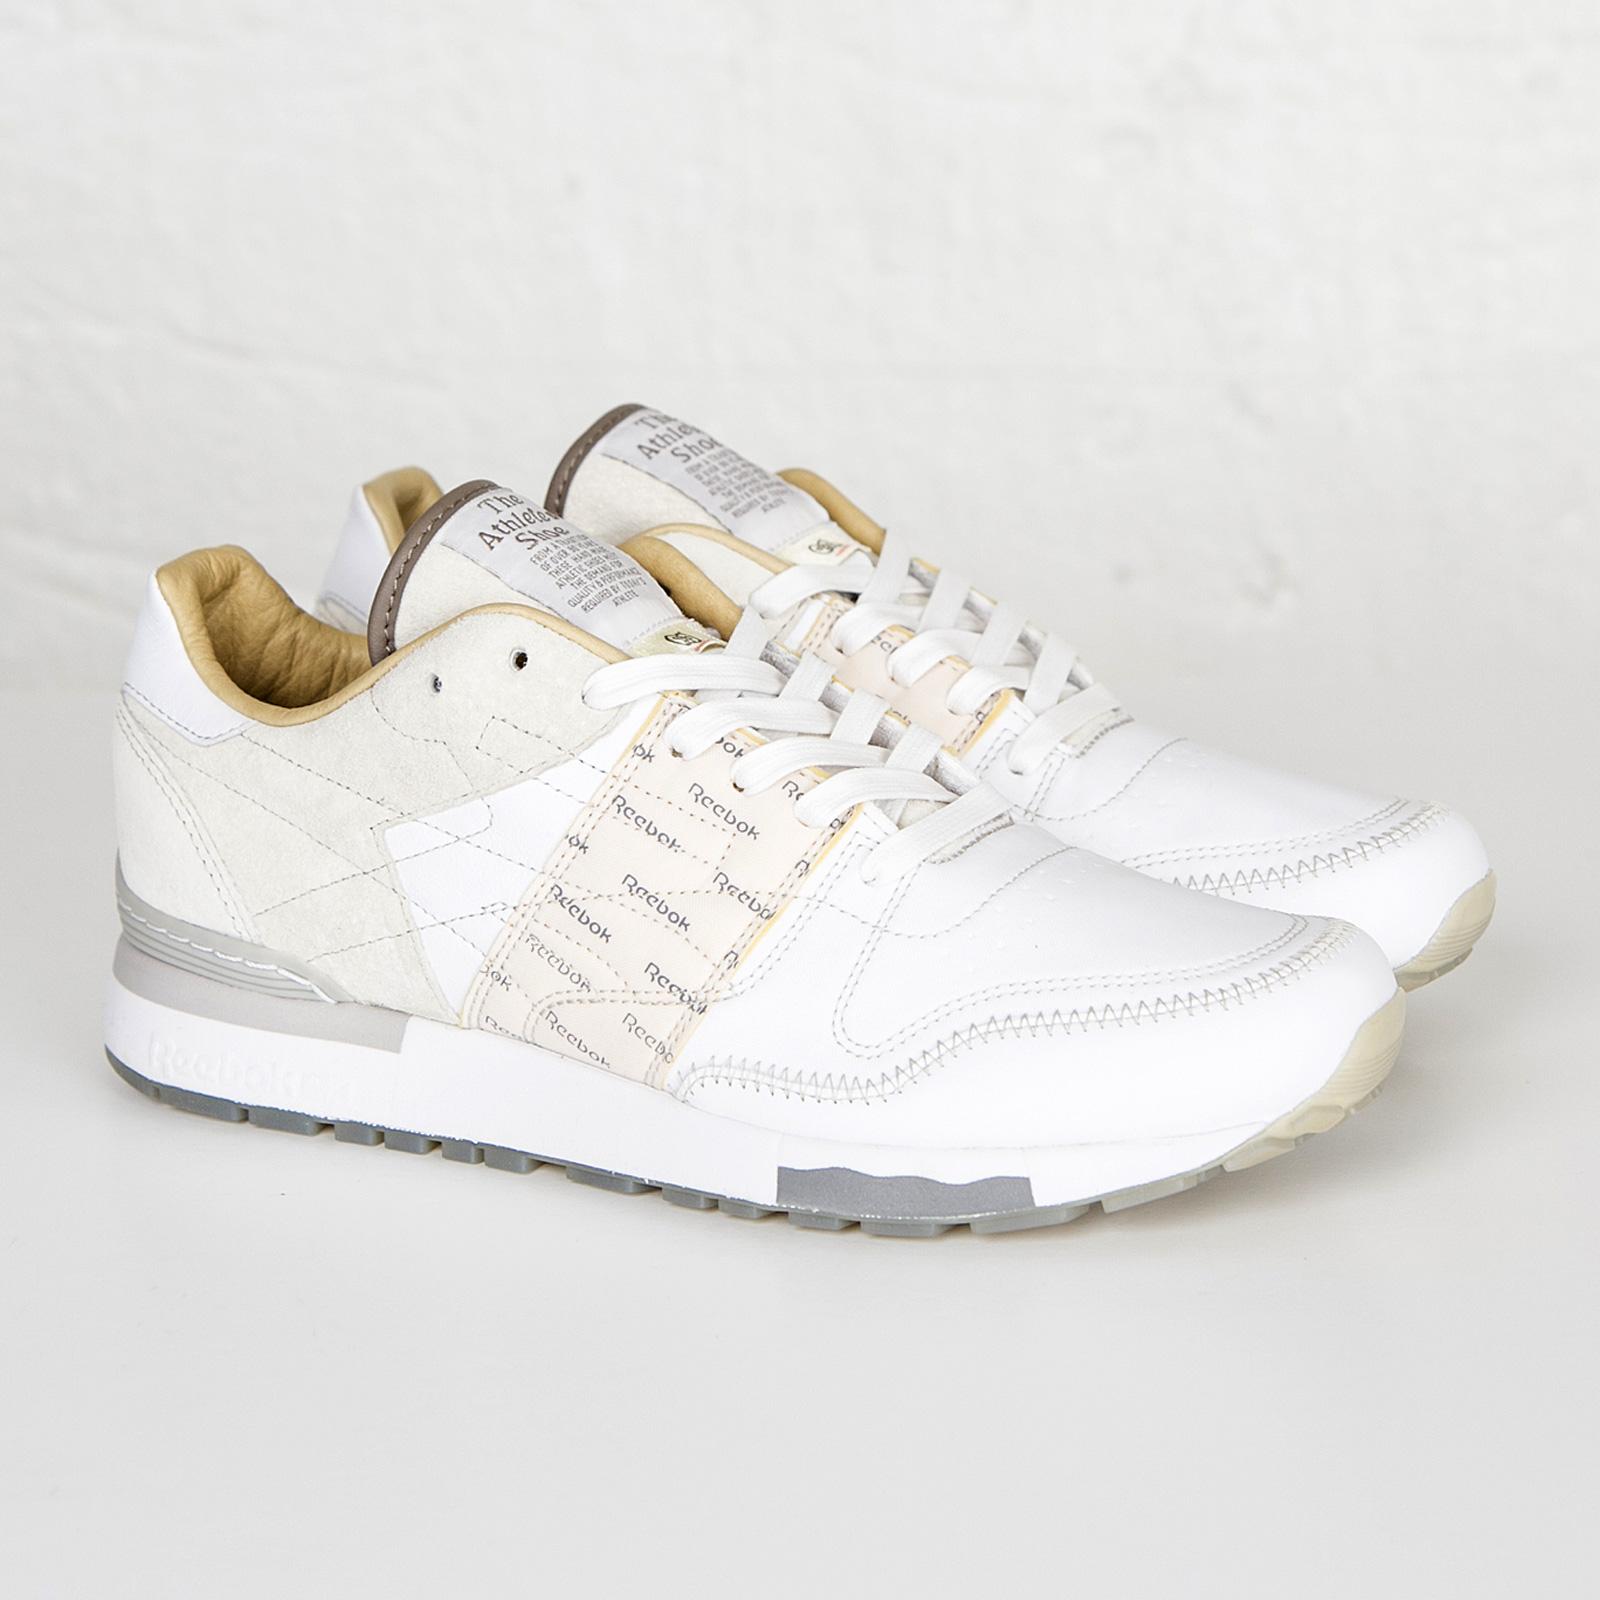 e3a544f7e41 Reebok GS Classic Leather 6000 - M48356 - Sneakersnstuff